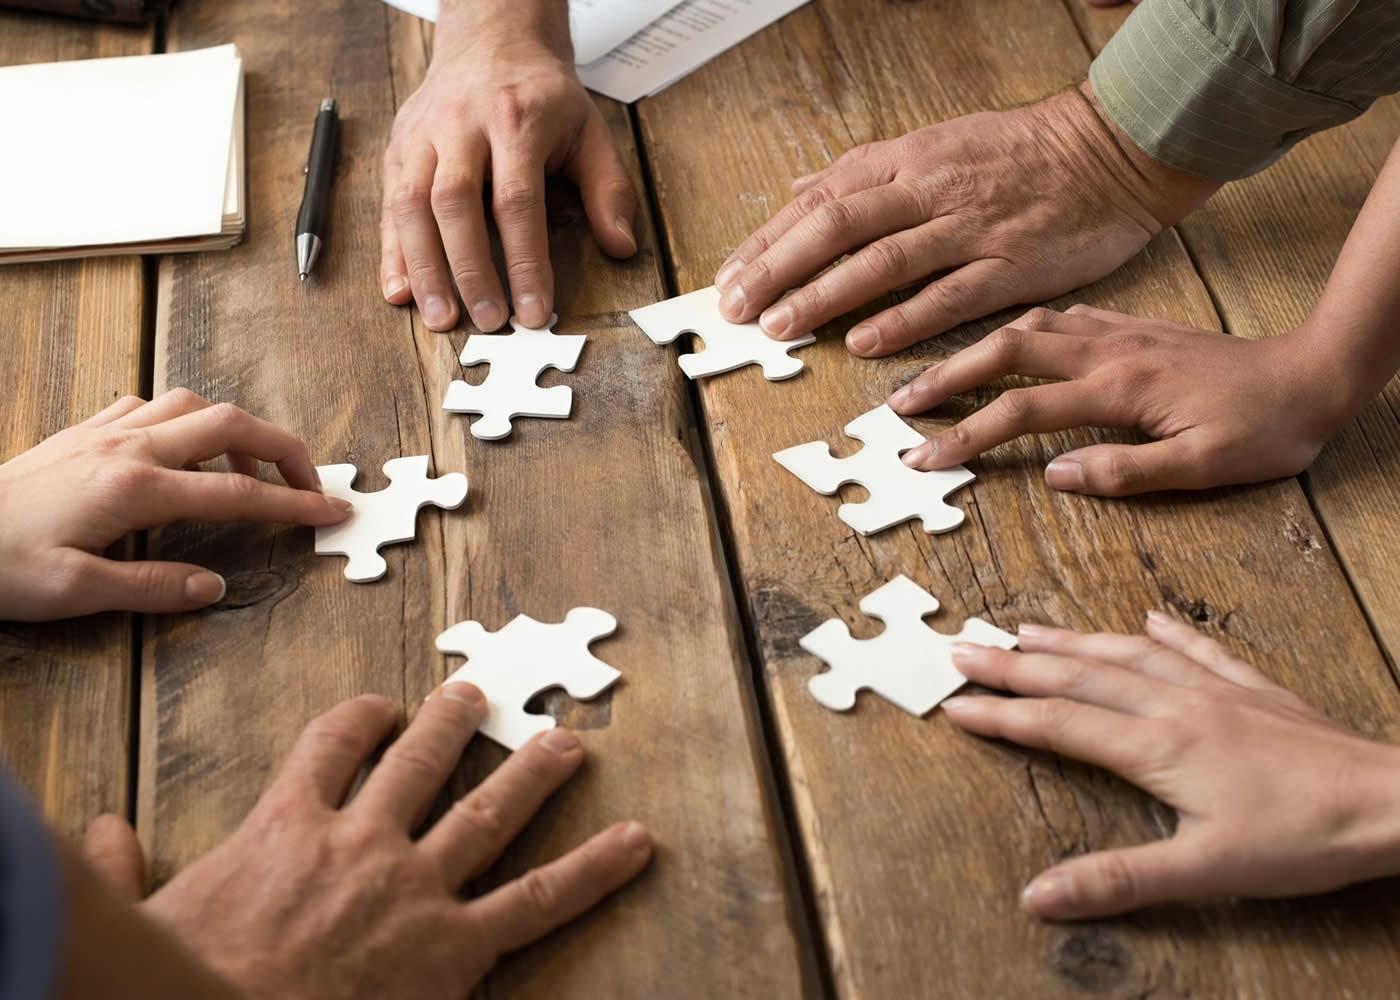 naem-2018-article-closeup-businessman-woman-jigsaw-puzzle-pieces-700x500